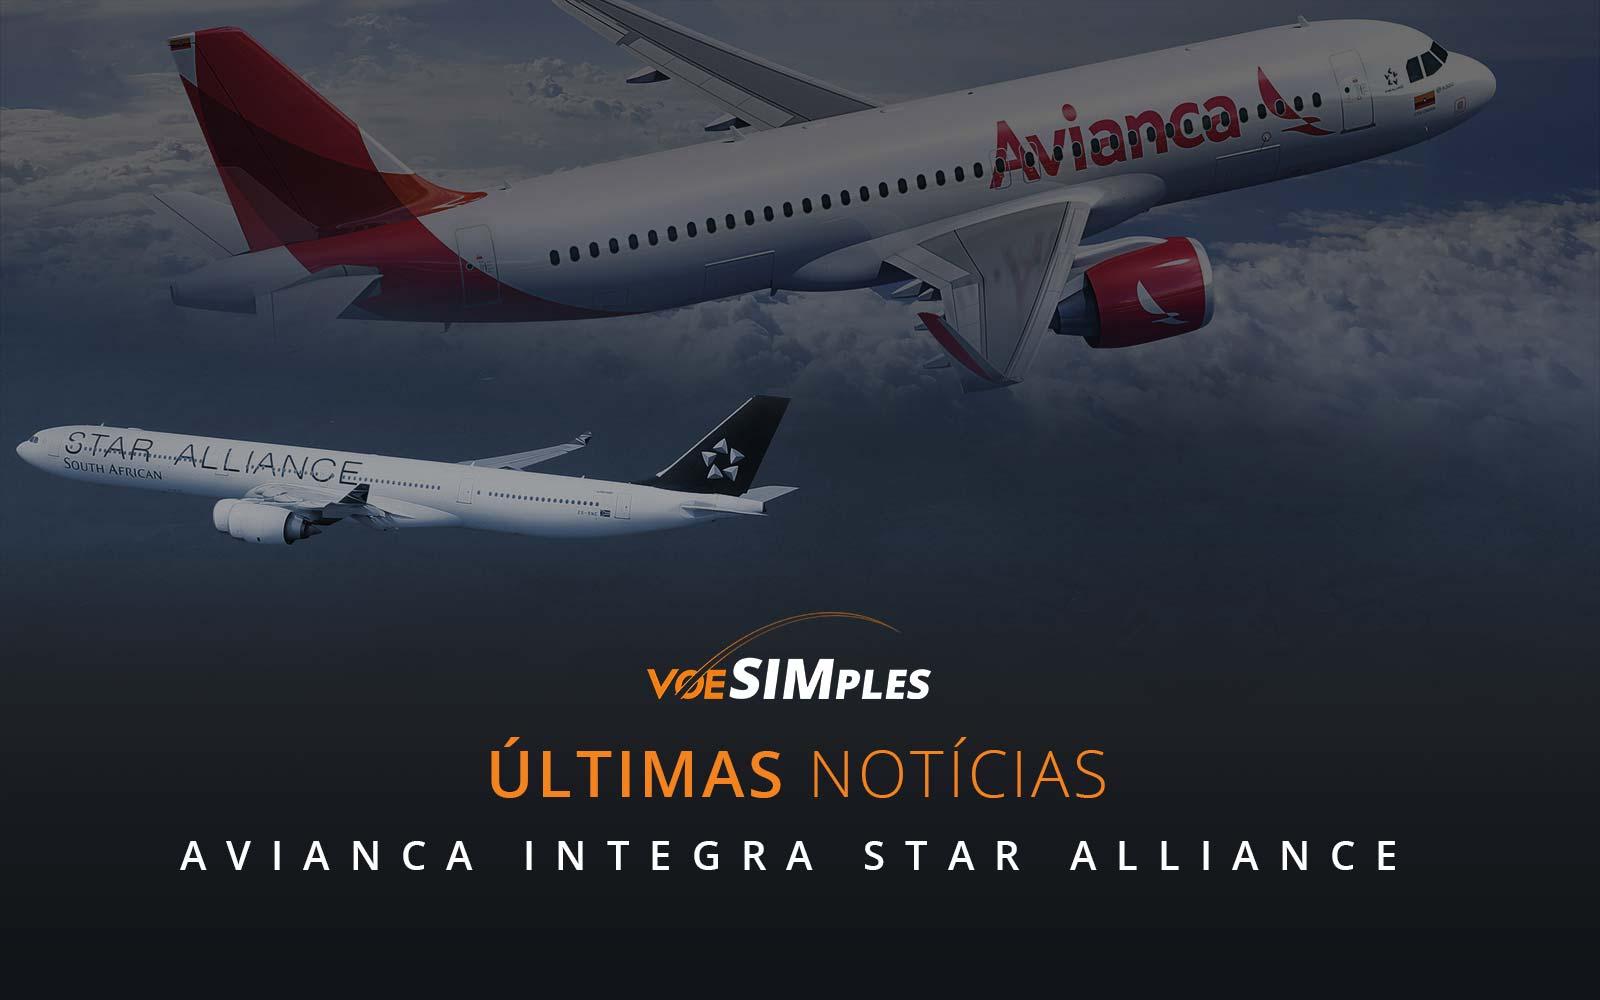 Avianca Brasil se une à Star Alliance